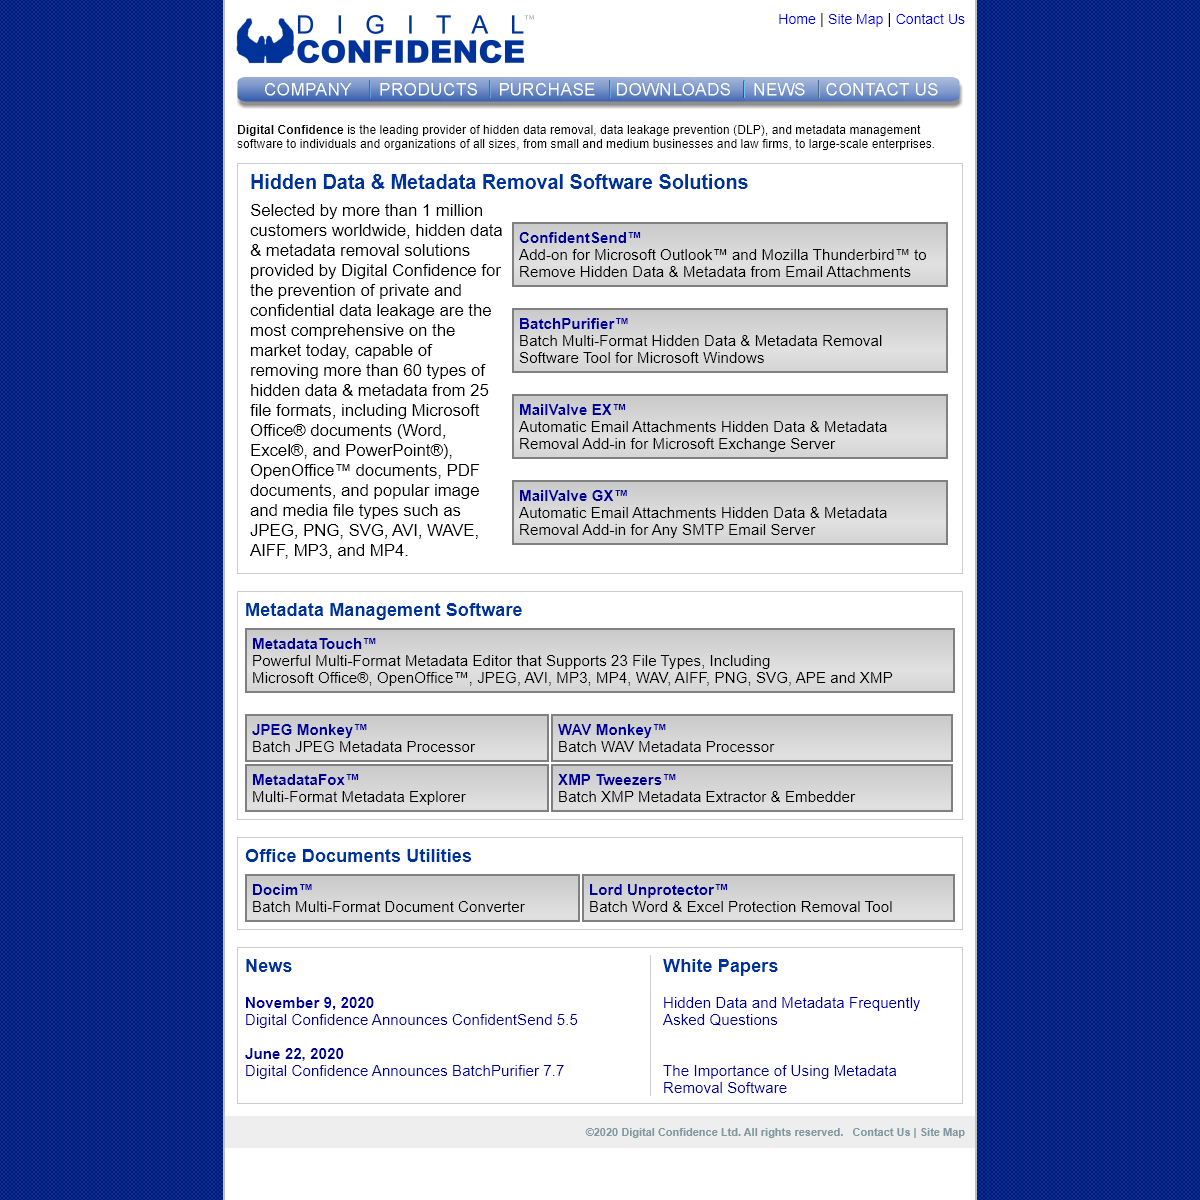 Digital Confidence - Hidden Data Removal and Metadata Management